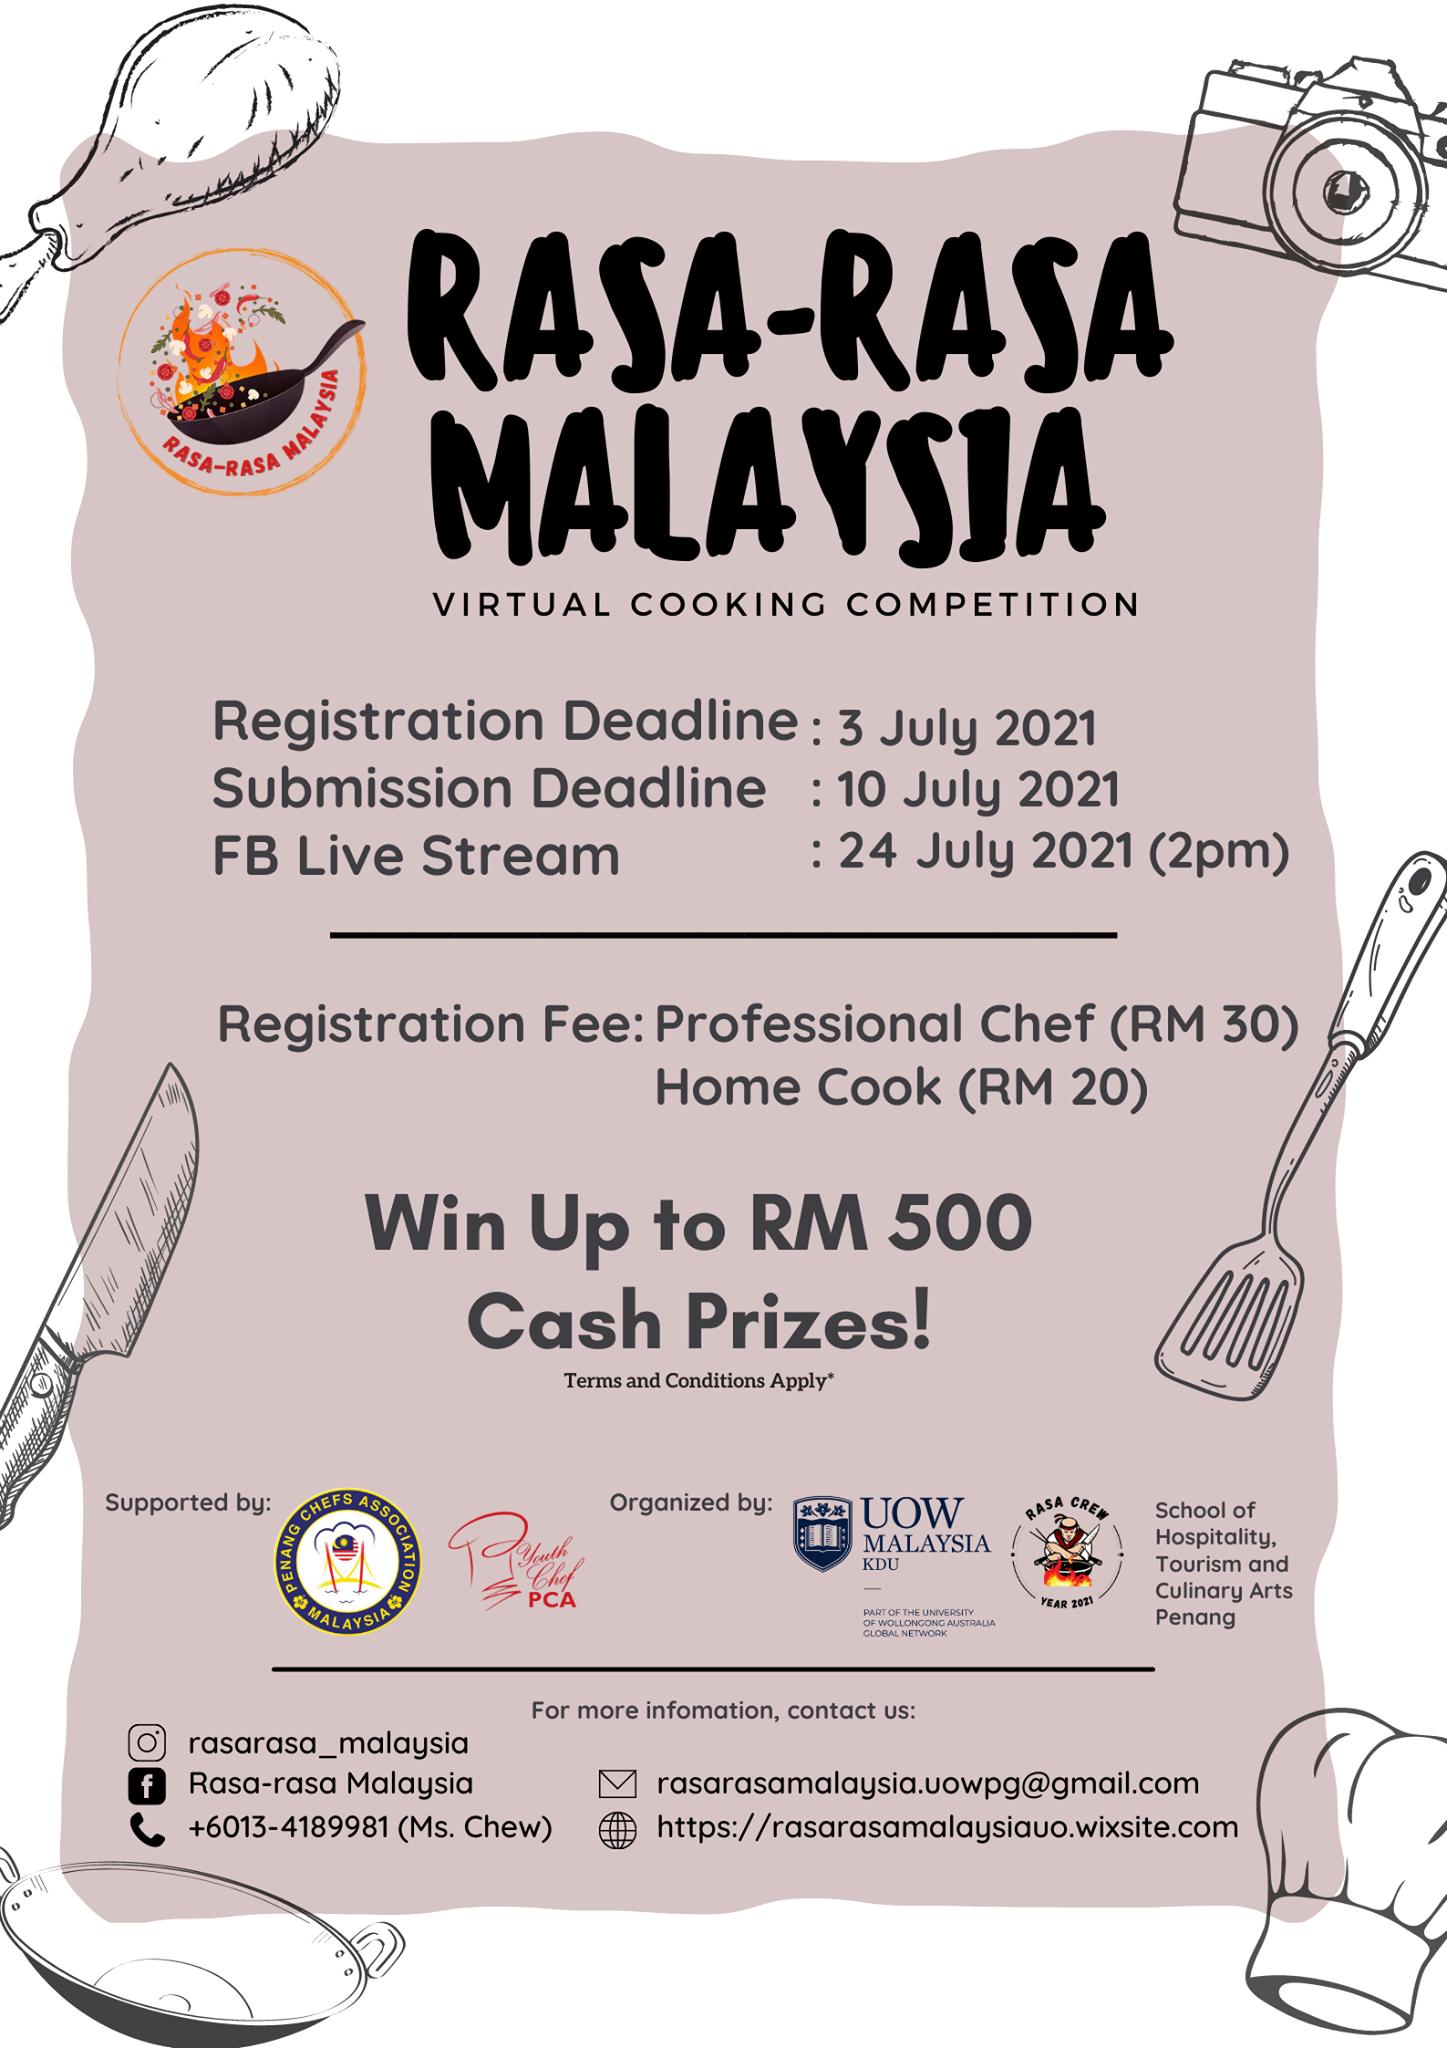 The Rasa-rasa Malaysia Virtual Cooking Competition